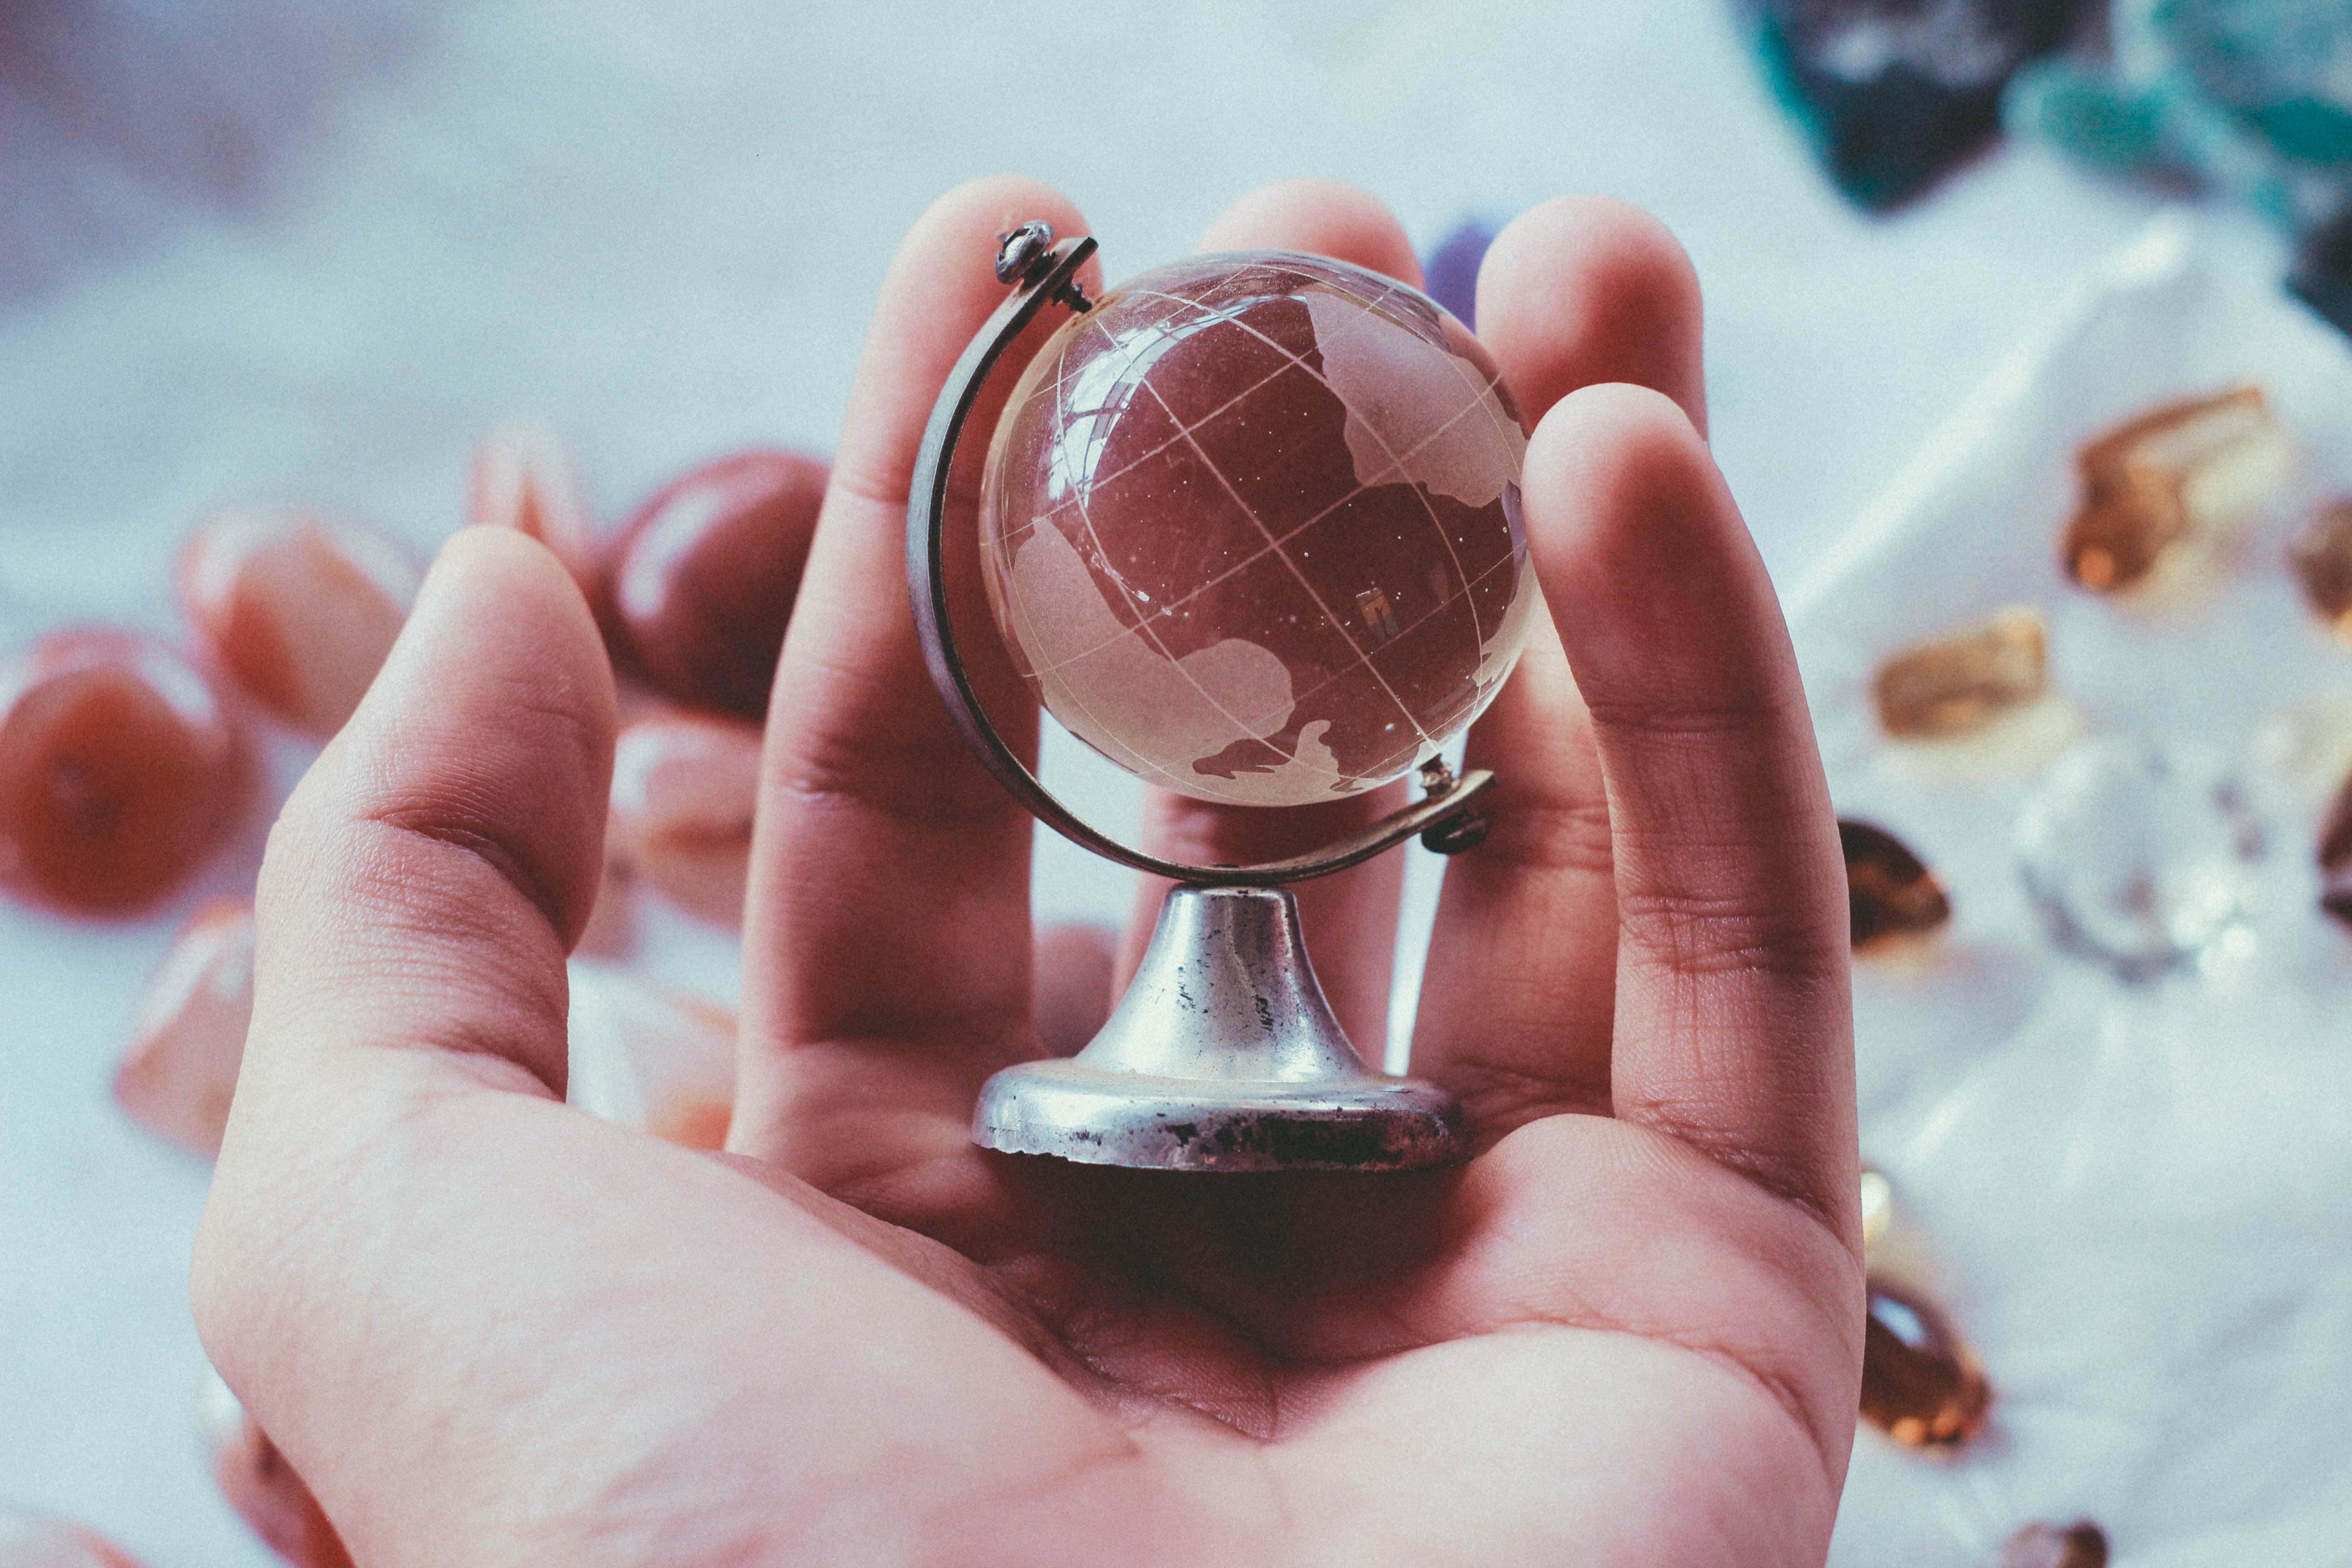 Lacunza competencia intercultural